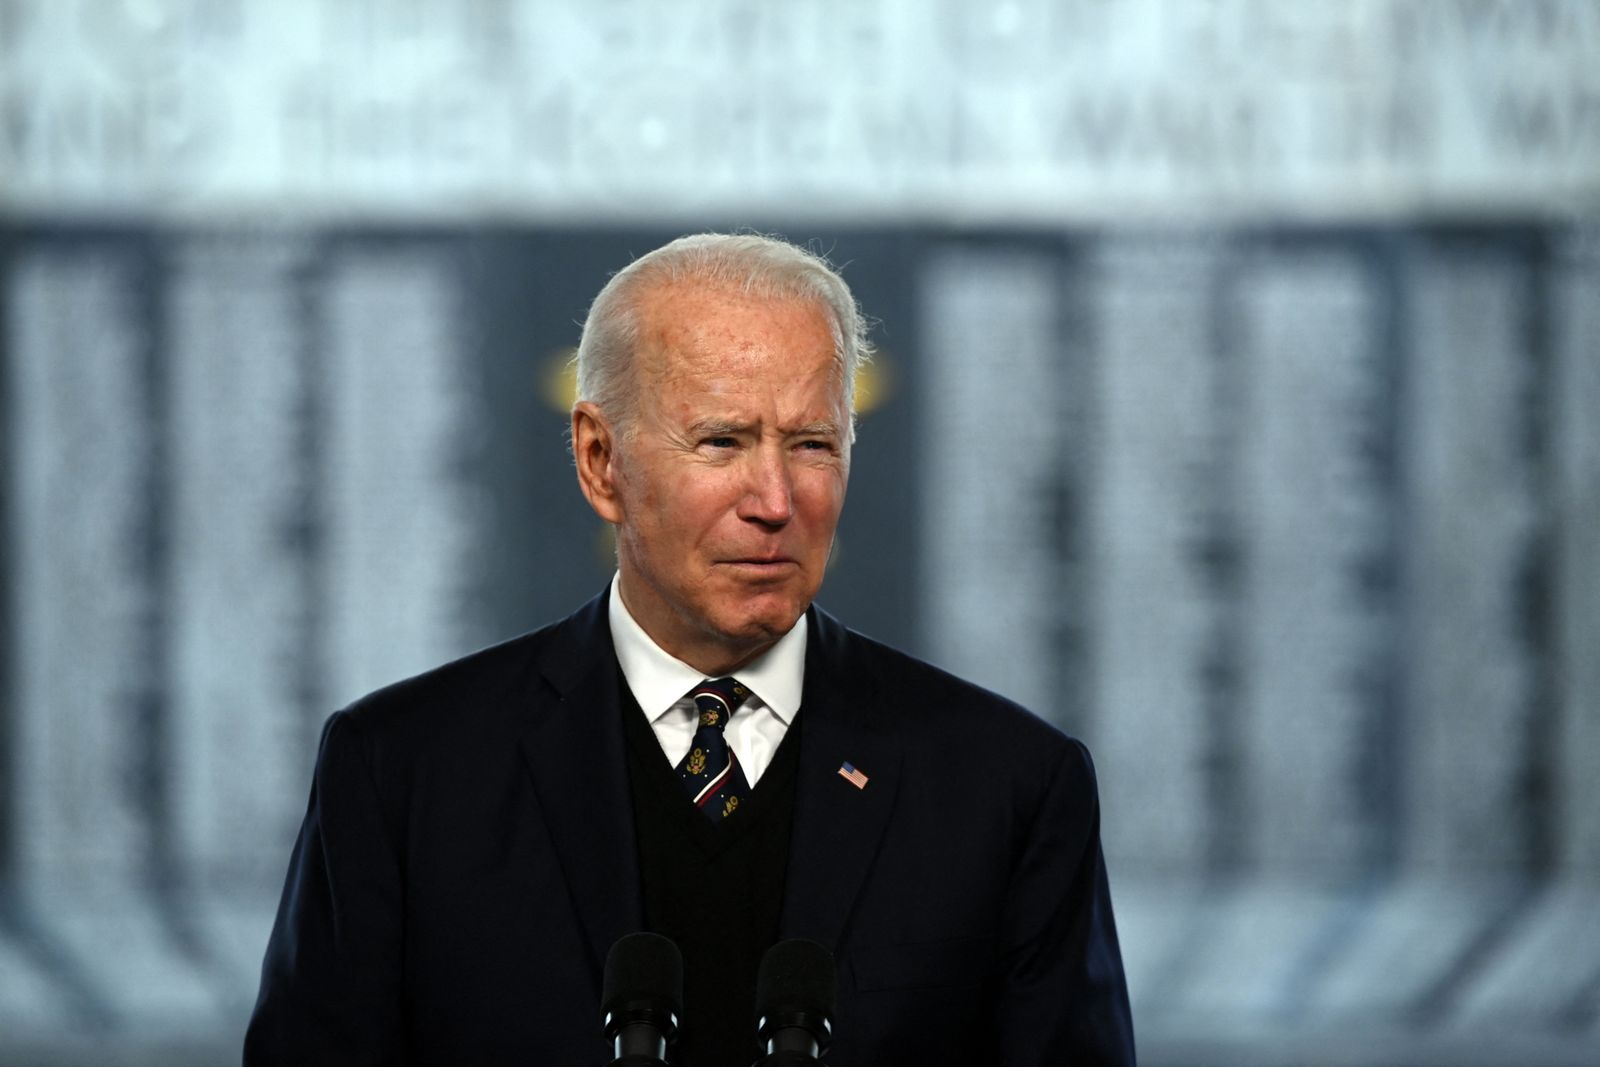 US-POLITICS-BIDEN-MEMORIAL